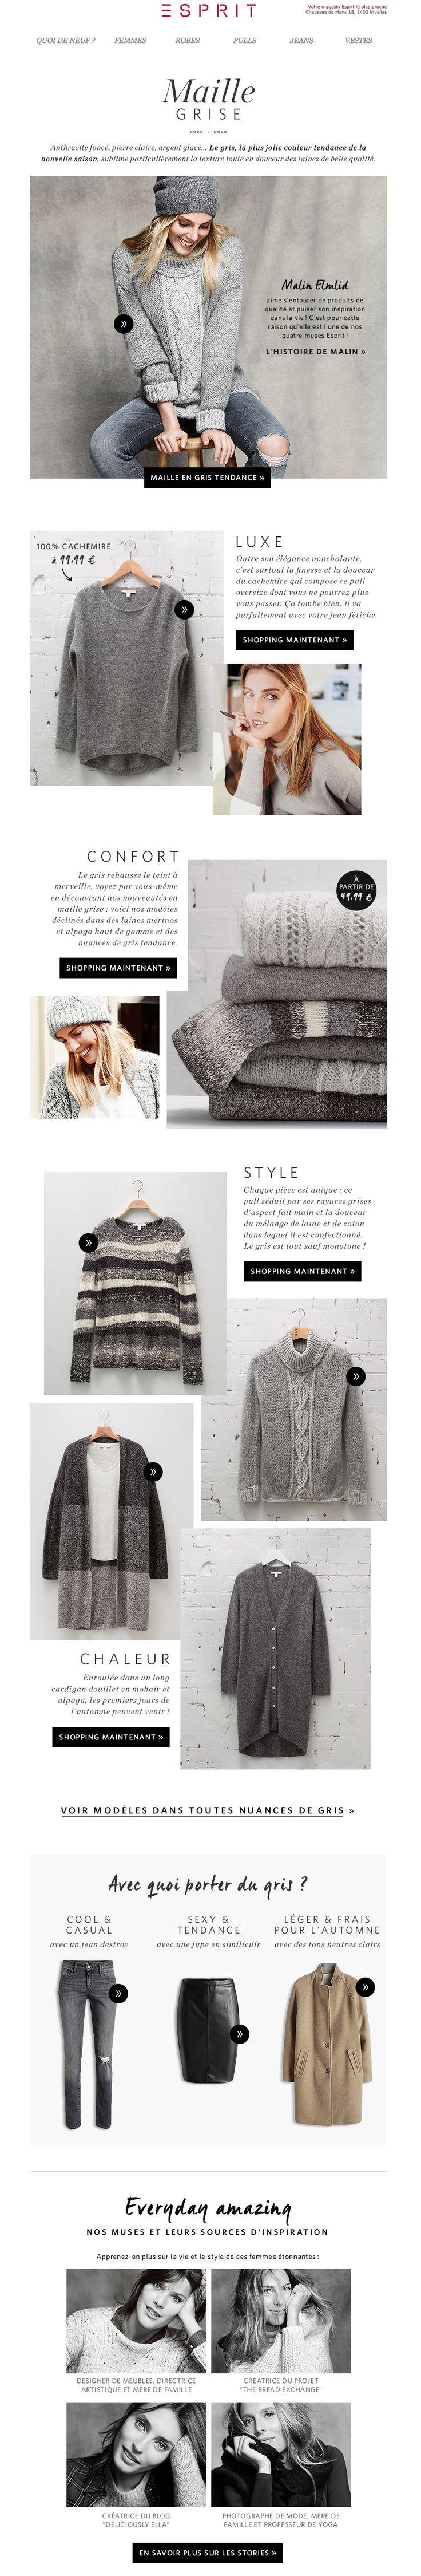 Esprit Newsletter | Grey Knitwear